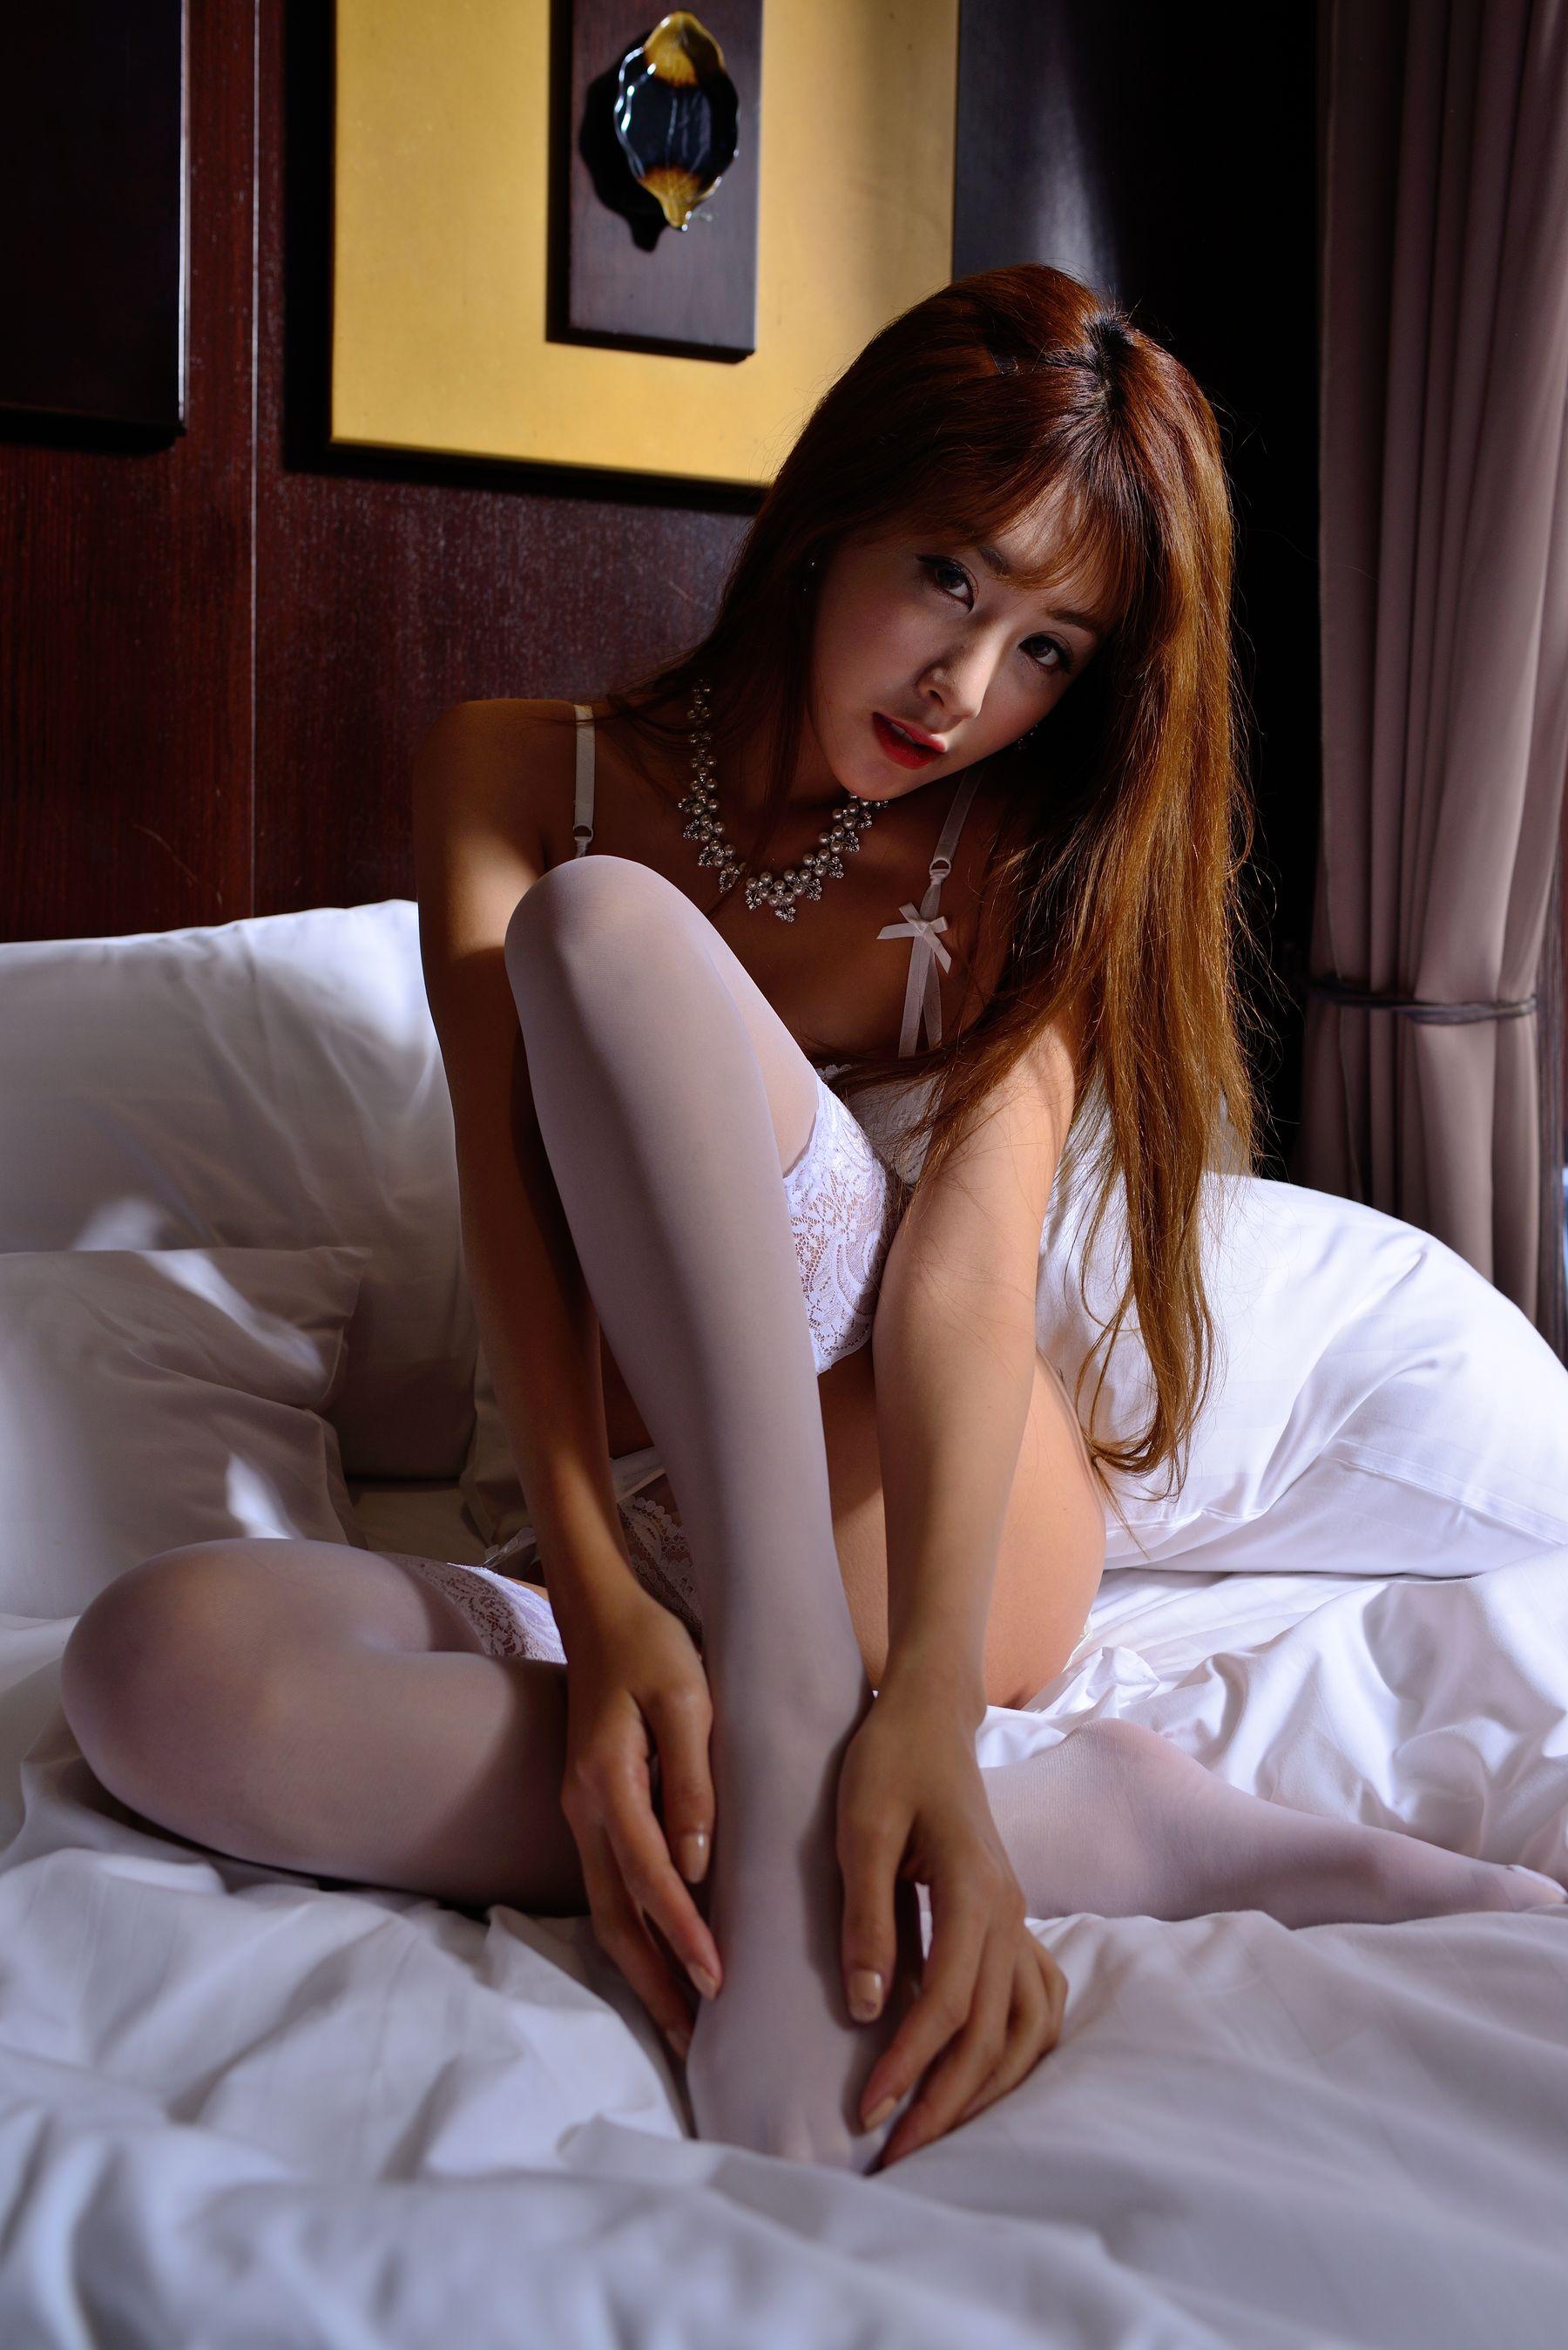 VOL.131 [台湾正妹]丝袜美女:夏晴(夏晴Miso,腿模Miso)超高清个人性感漂亮大图(27P)